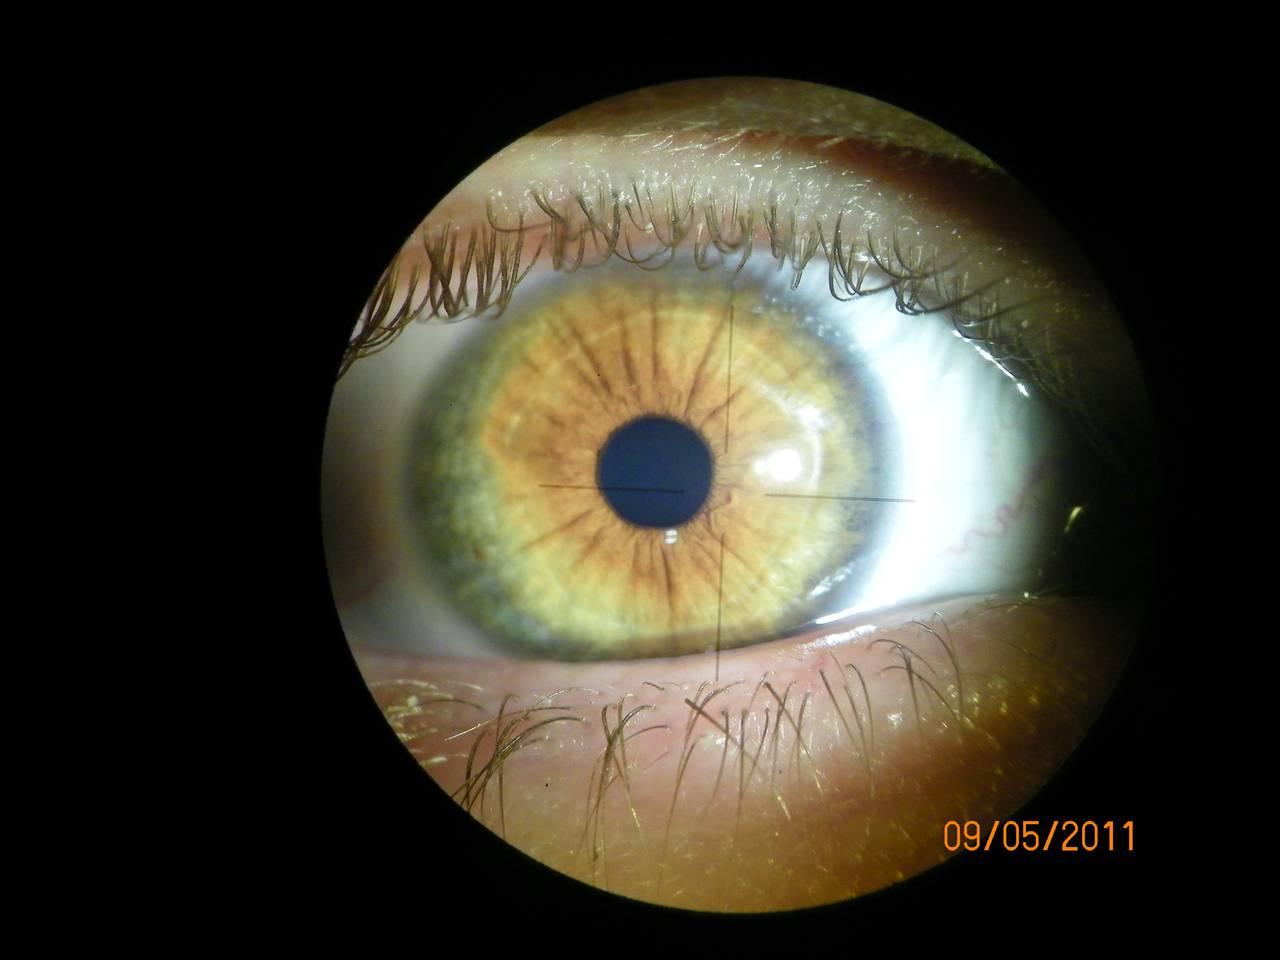 Augen- und Irisdiagnose